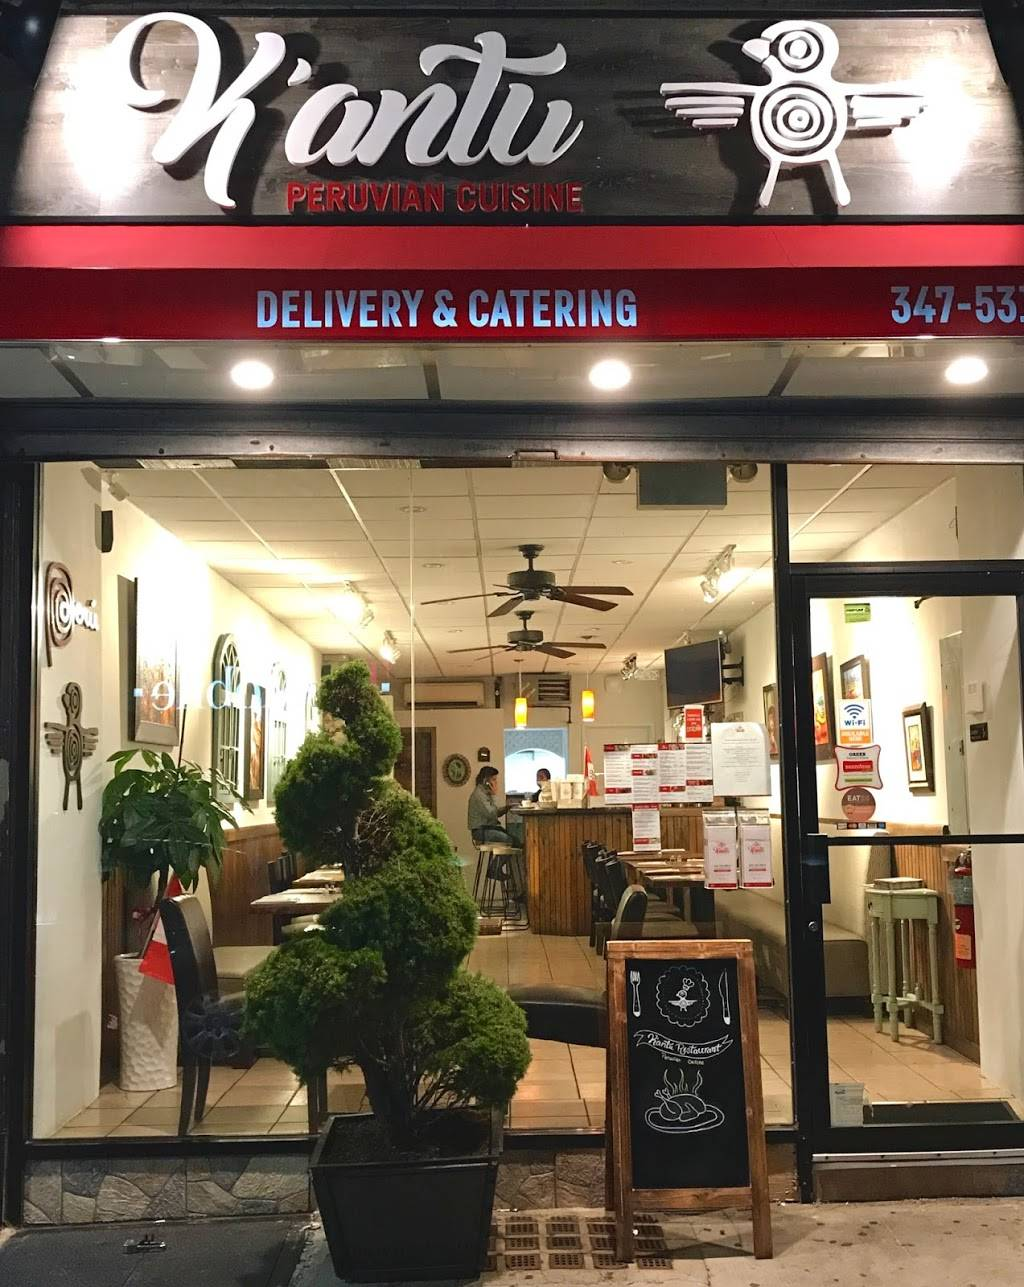 KANTU PERUVIAN CUISINE - Restaurant & Pisco Bar   restaurant   74-17 Metropolitan Ave, Middle Village, NY 11379, USA   3475310873 OR +1 347-531-0873